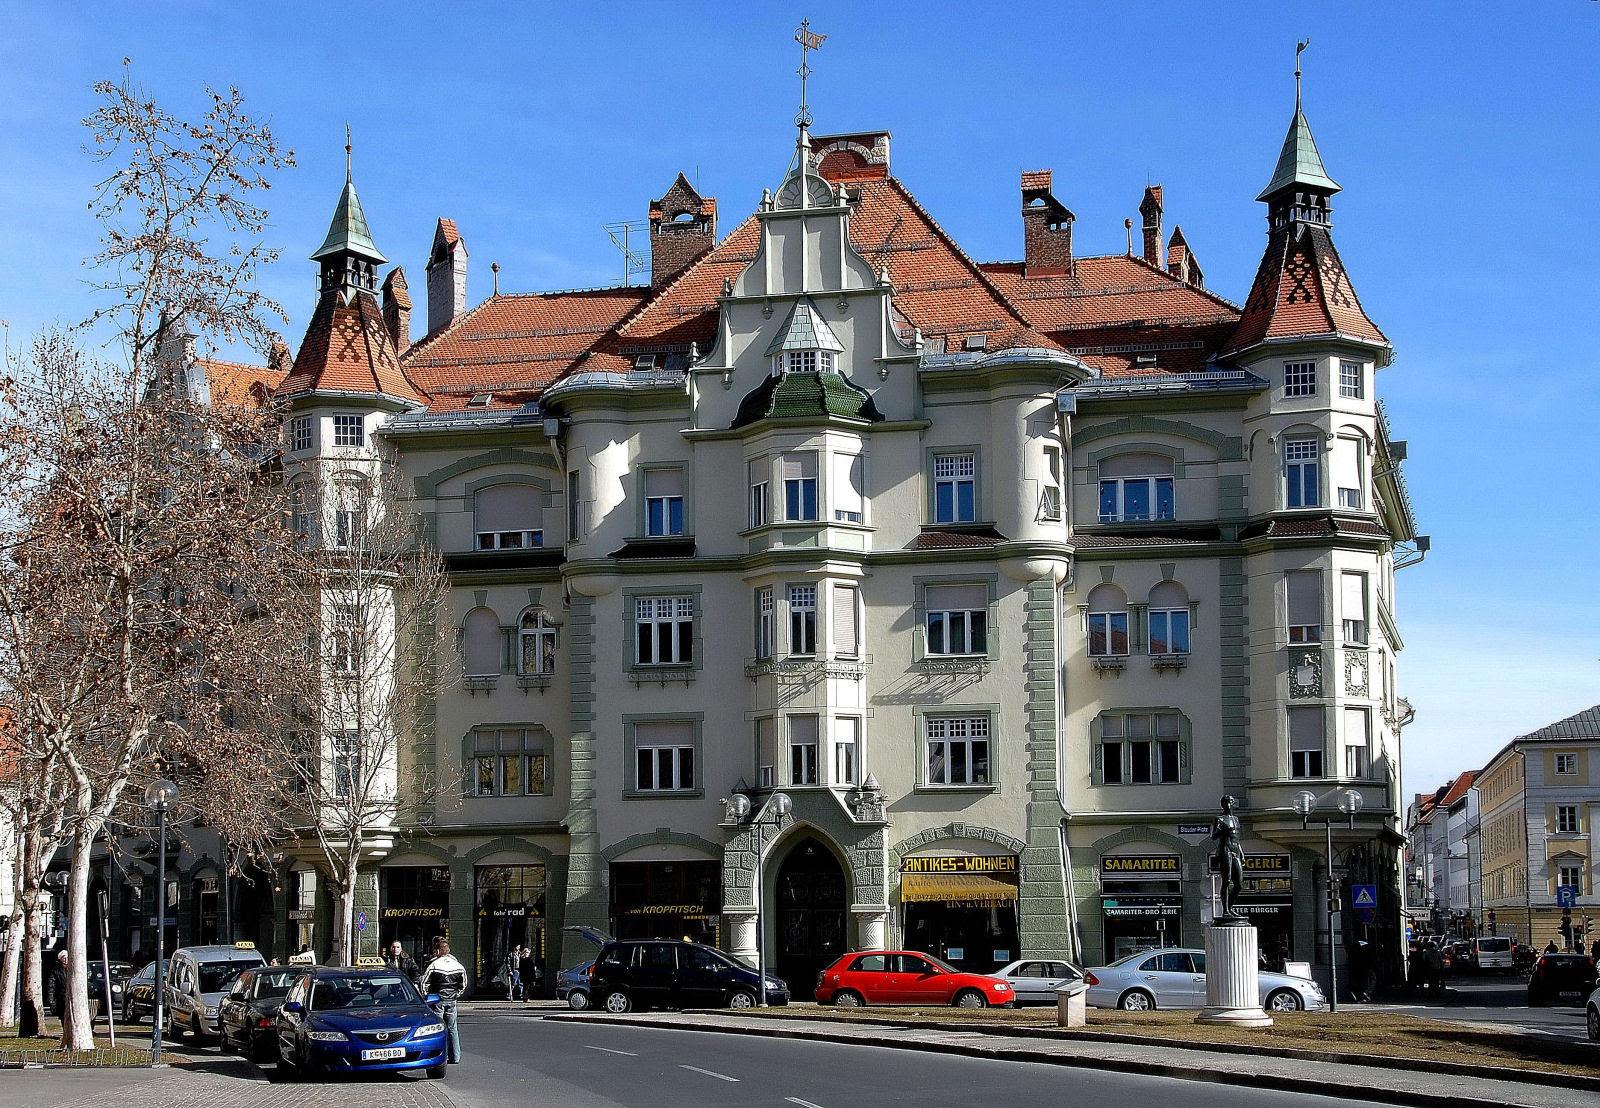 Visit And Explore Klagenfurt, the capital of Carinthia in Austria